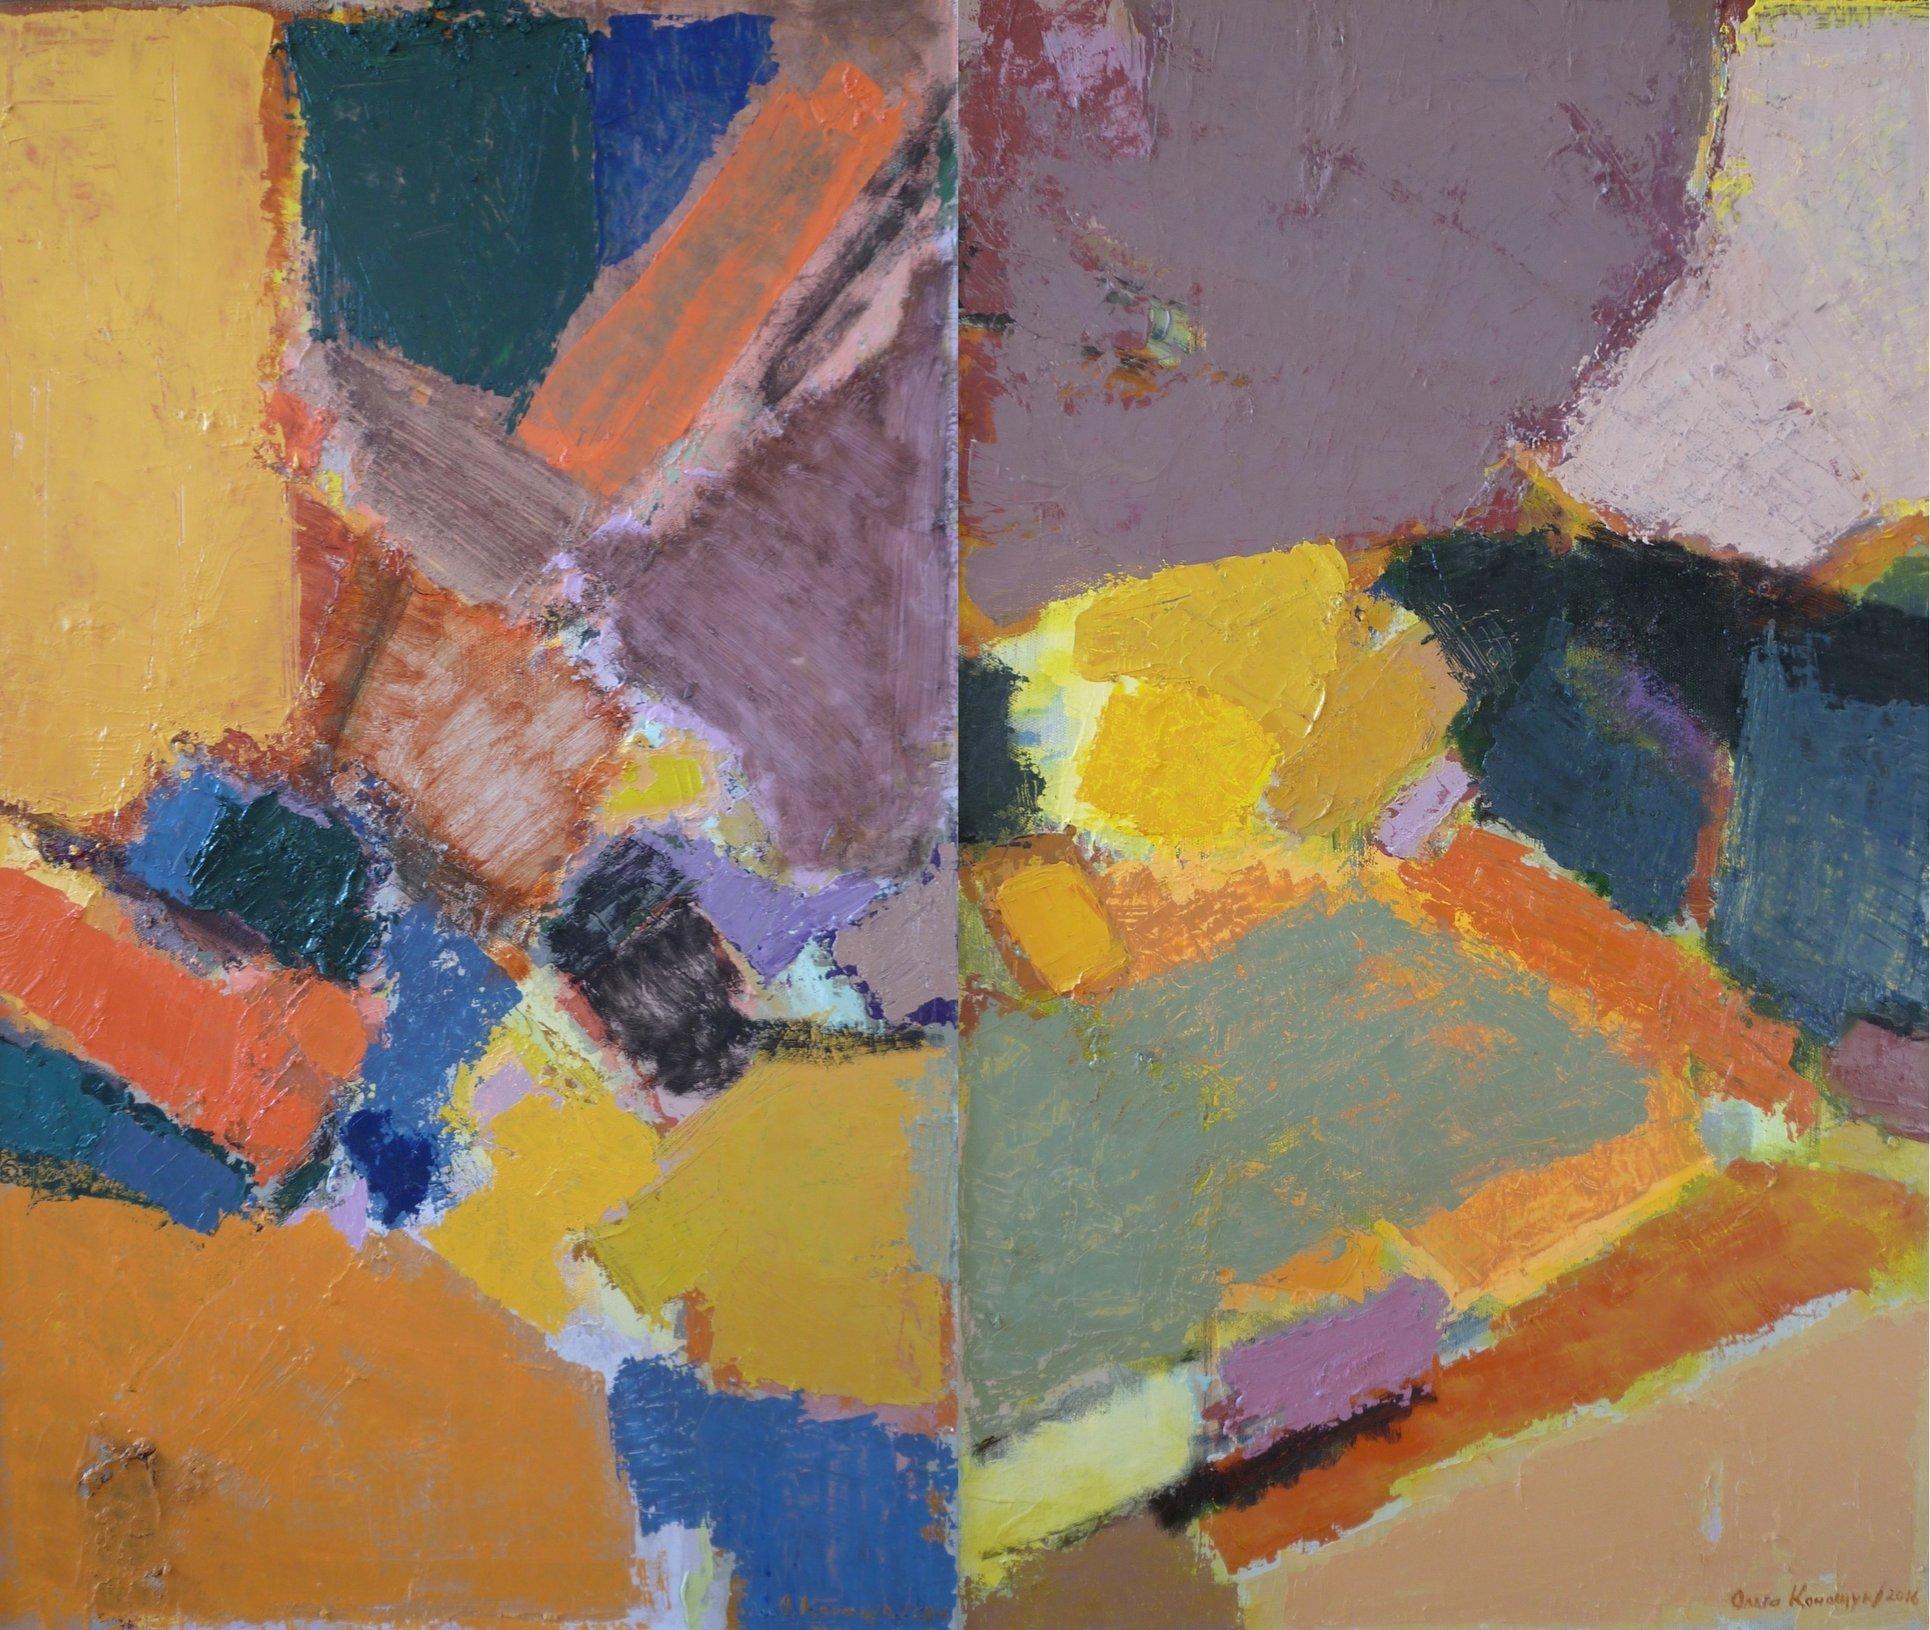 'Formation of the landscape I, II'